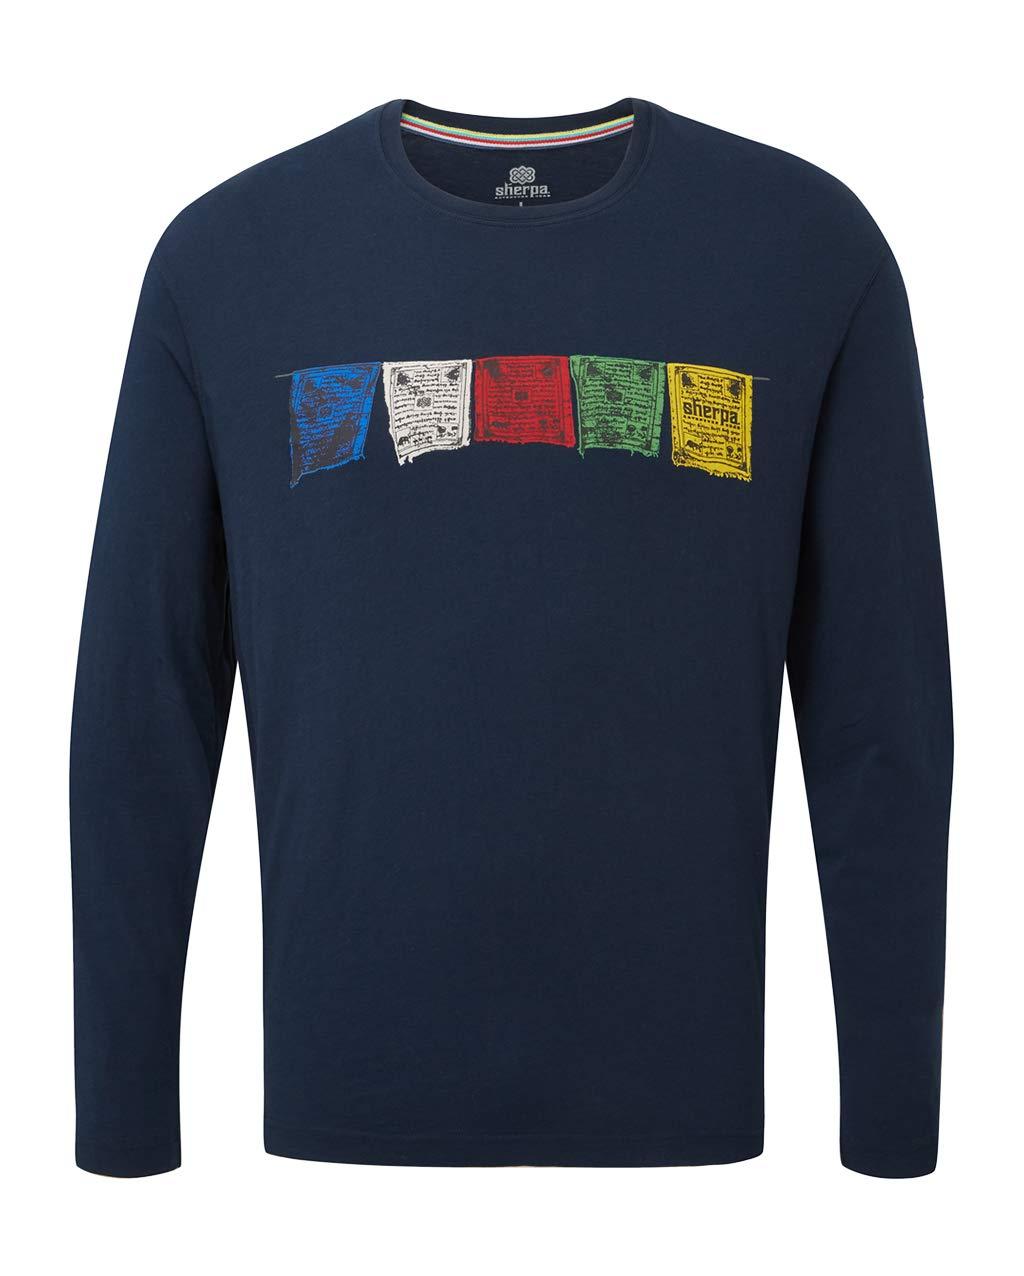 Sherpa Herren Tarcho Long Sleeve Tee T-Shirt B07DZ7L46P Langarmshirts Günstigen Günstigen Günstigen Preis 6a53ea